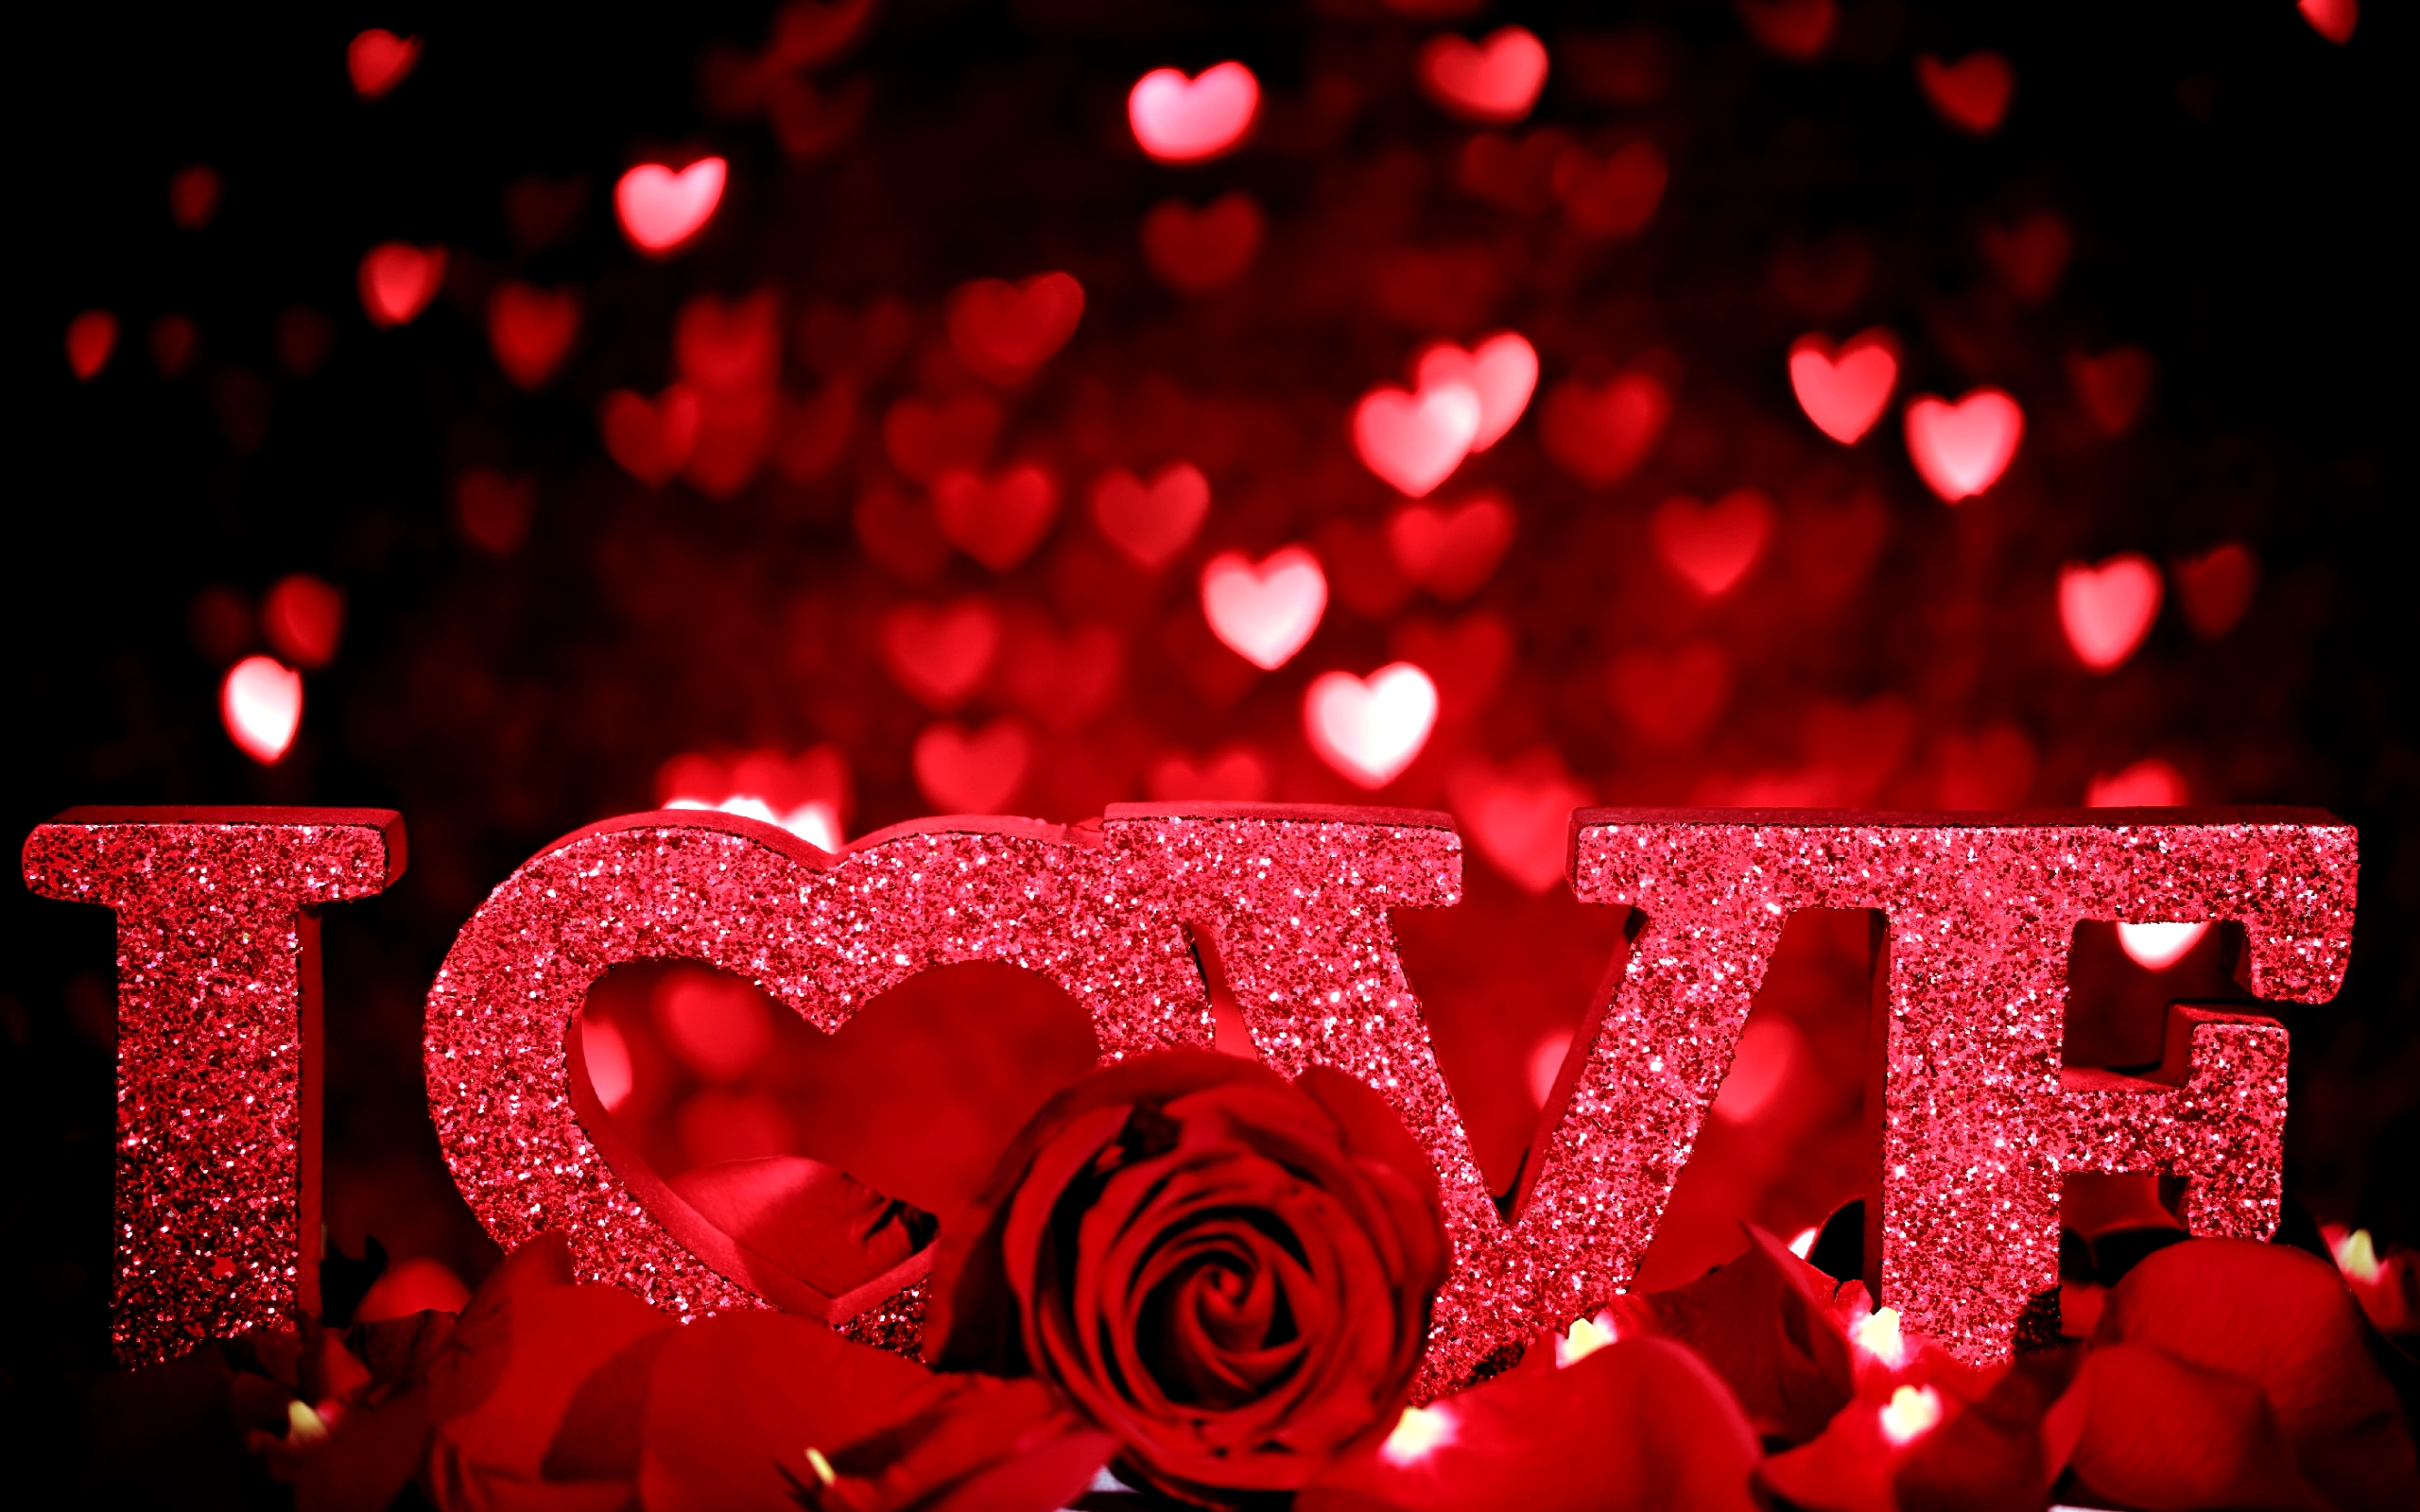 بالصور حب صور , الحب فى صوره جميله 4702 6